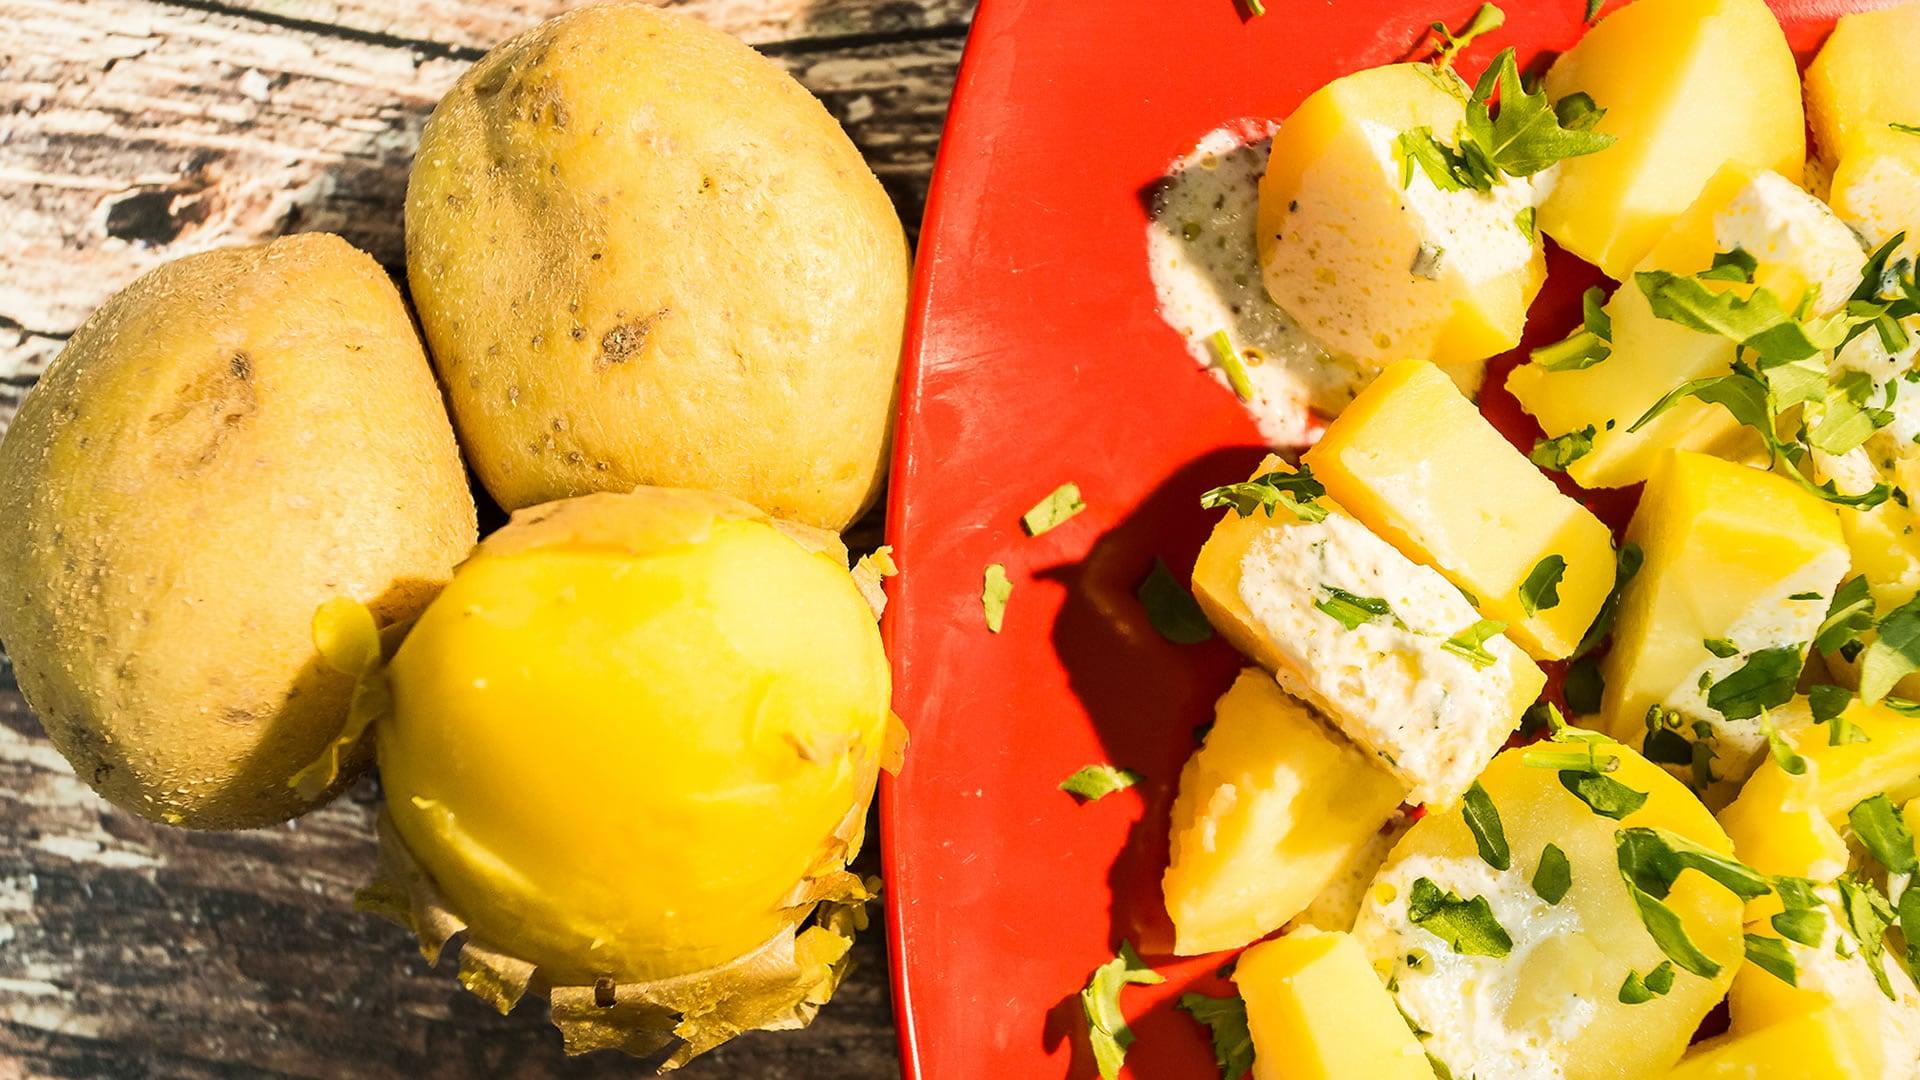 Foto Patate Lesse - Tutti i Trucchi per Bollire le Patate